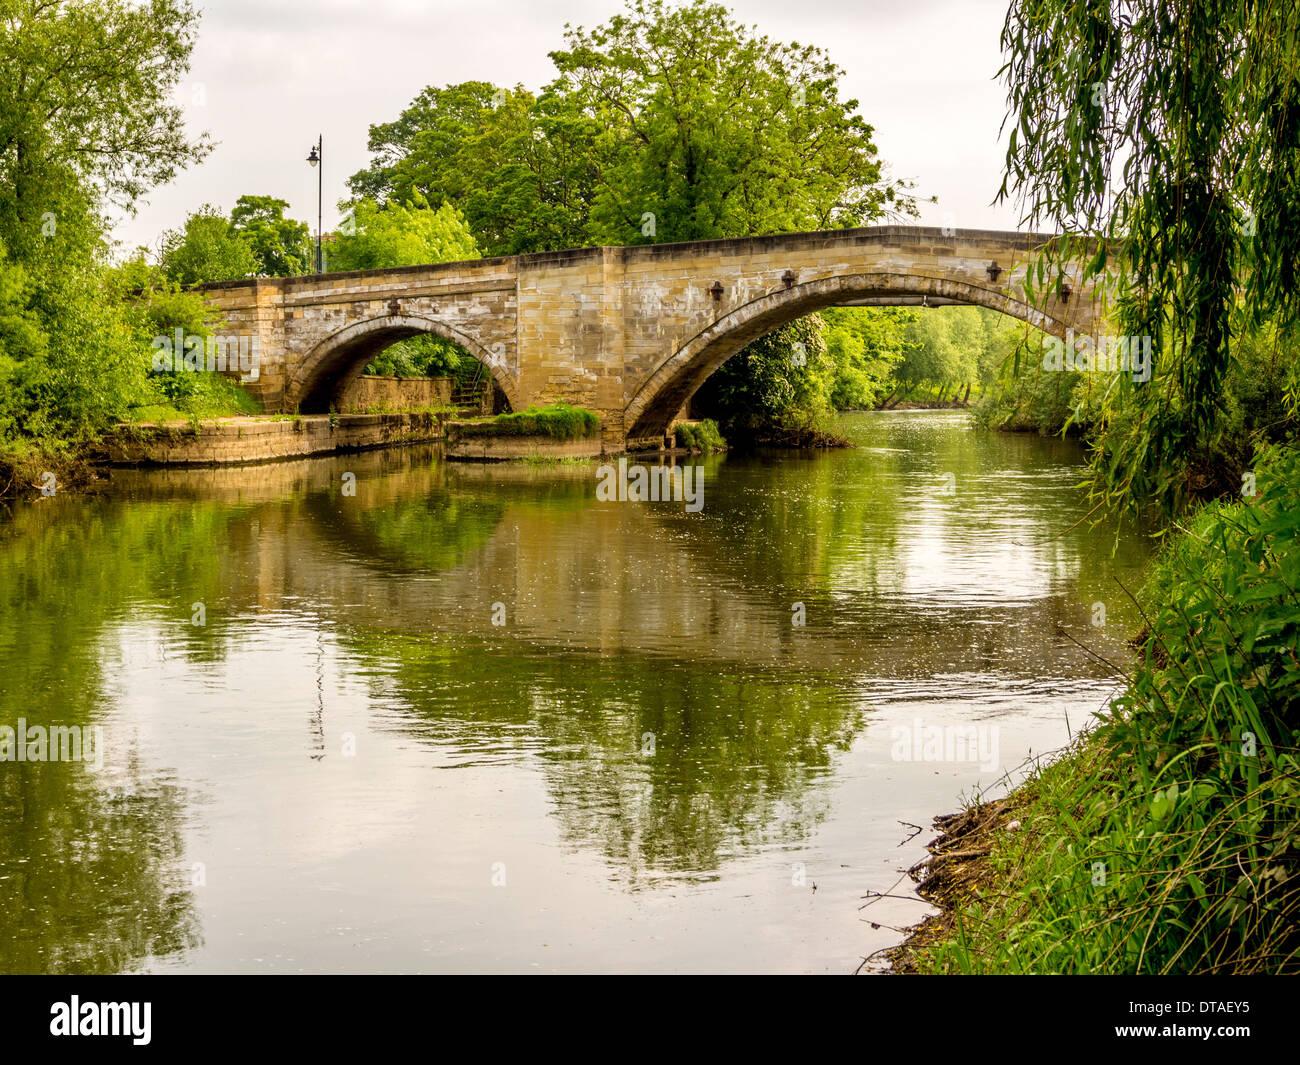 Bridge over River Derwent at Stamford Bridge, Yorkshire. - Stock Image